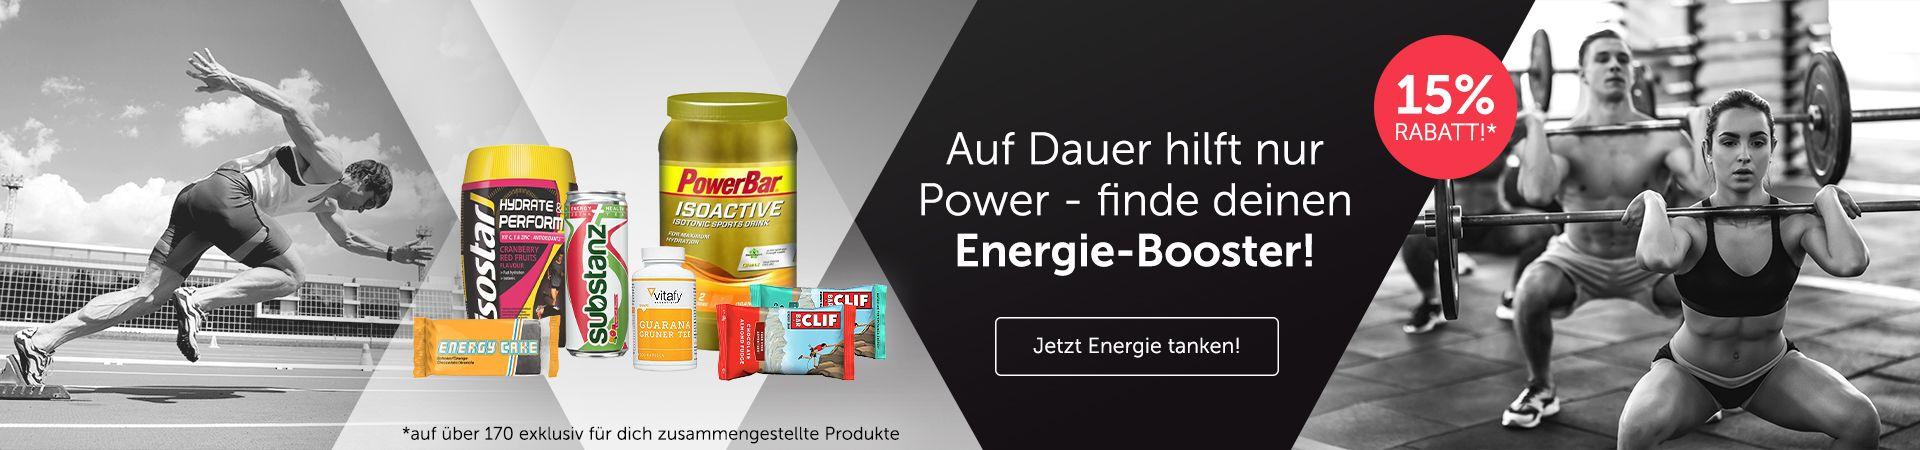 20180817_Energie Aktion 15proz